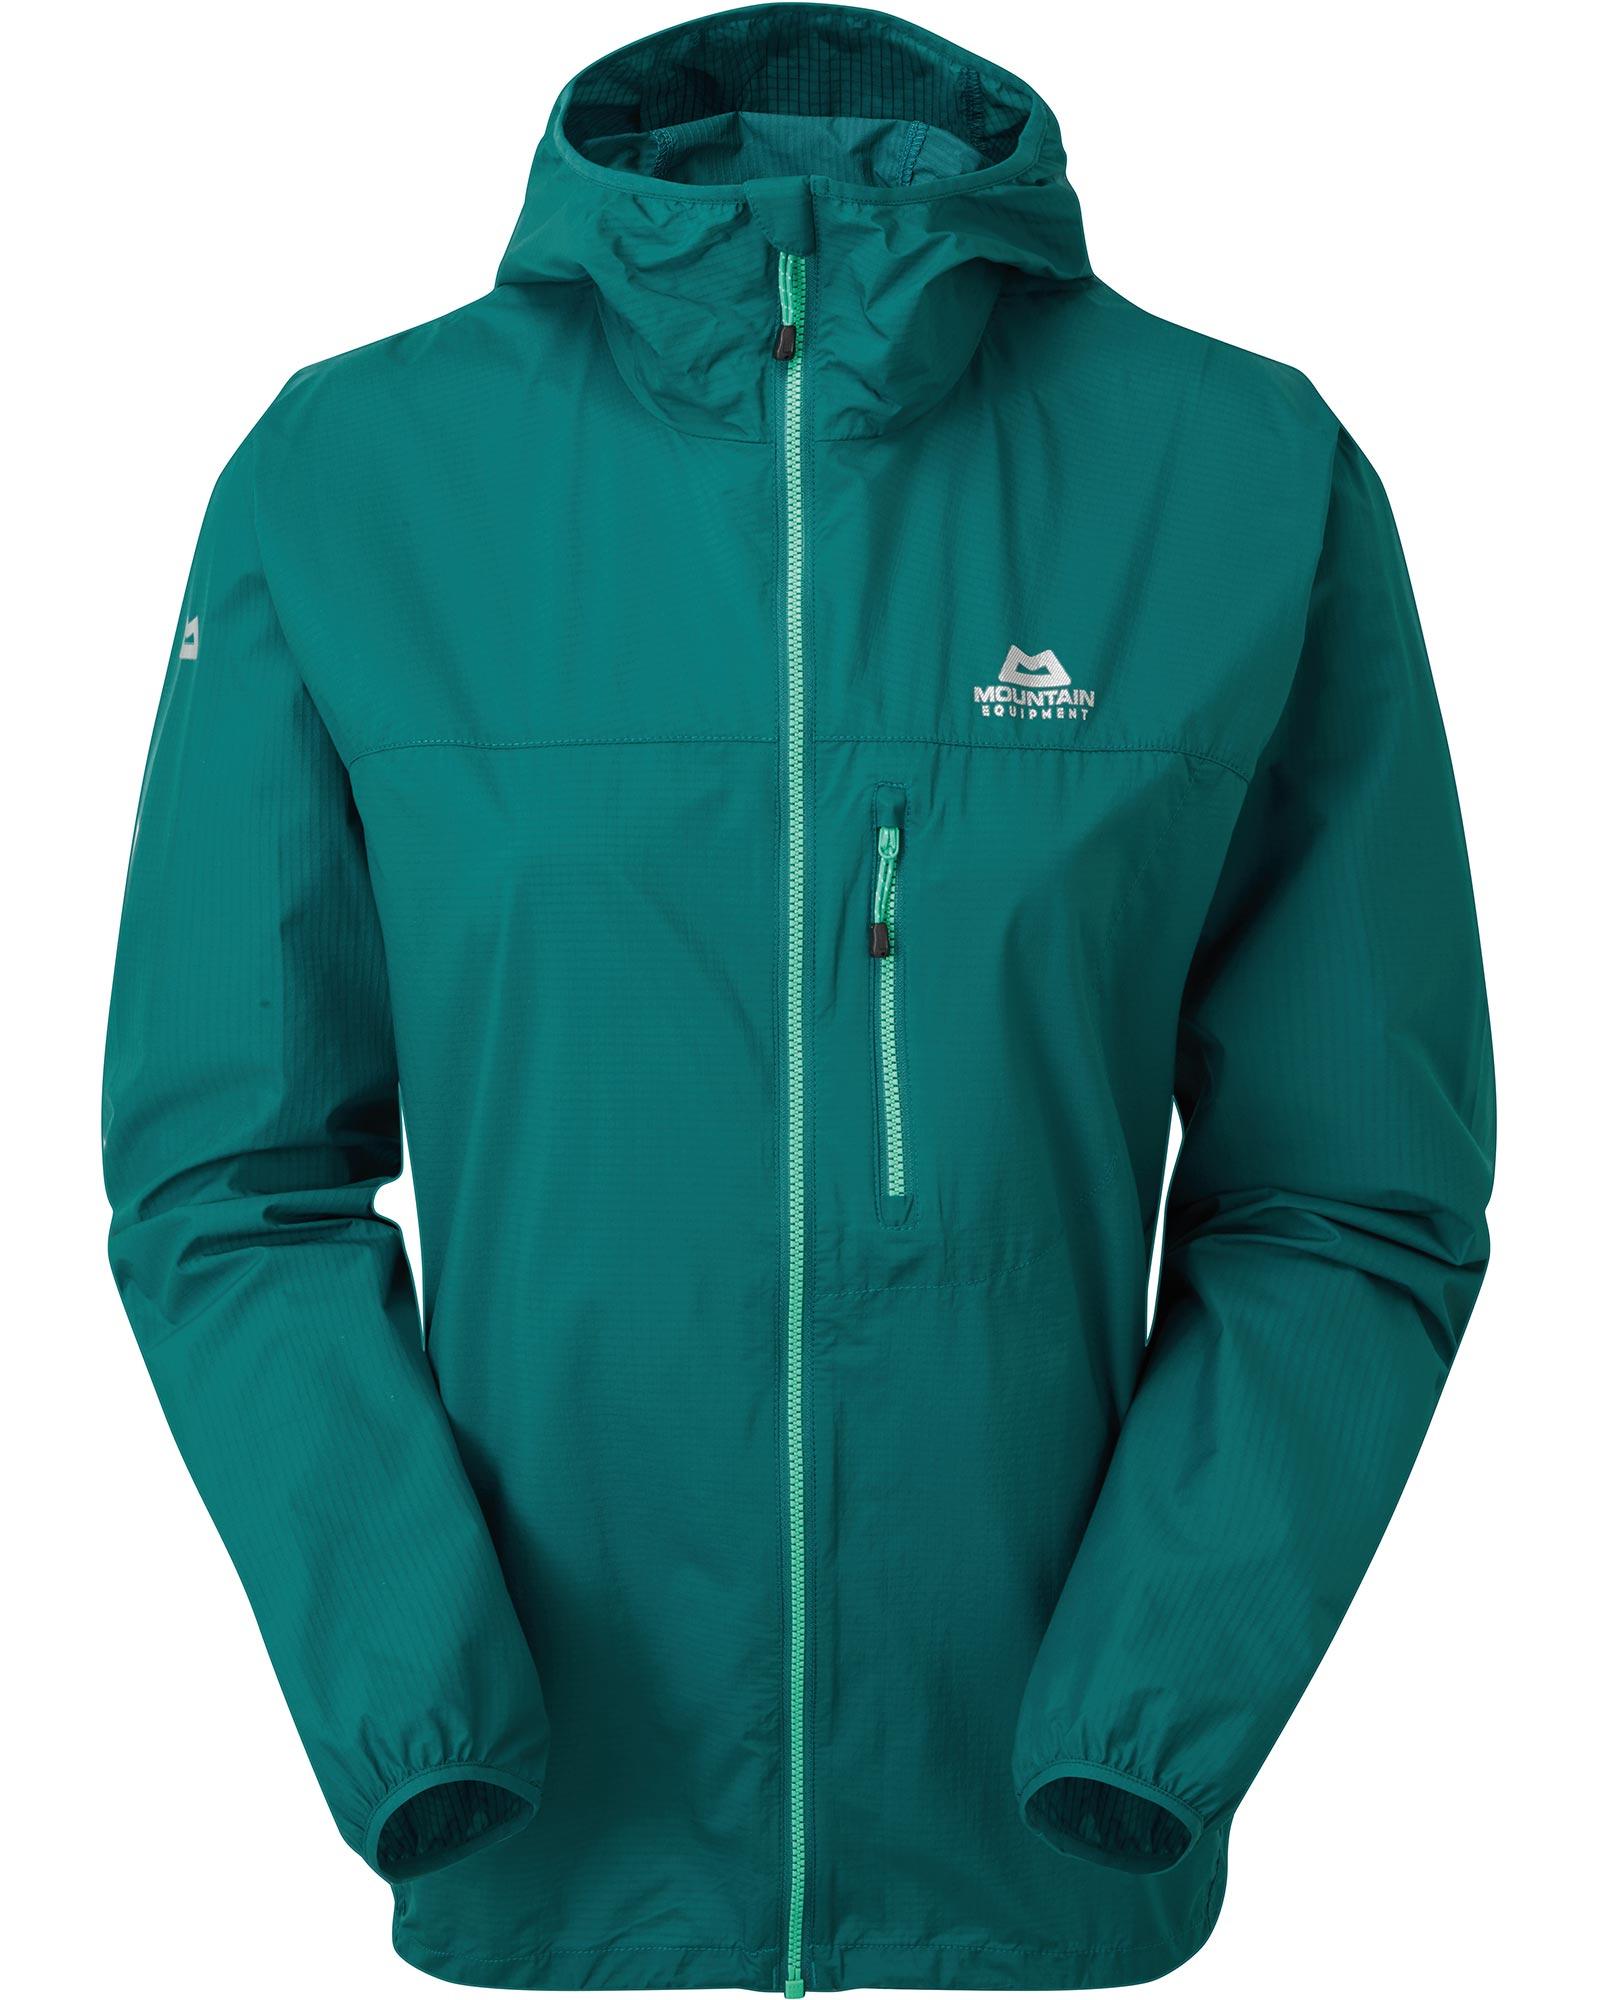 Mountain Equipment Women's Aerofoil Full Zip Jacket 0